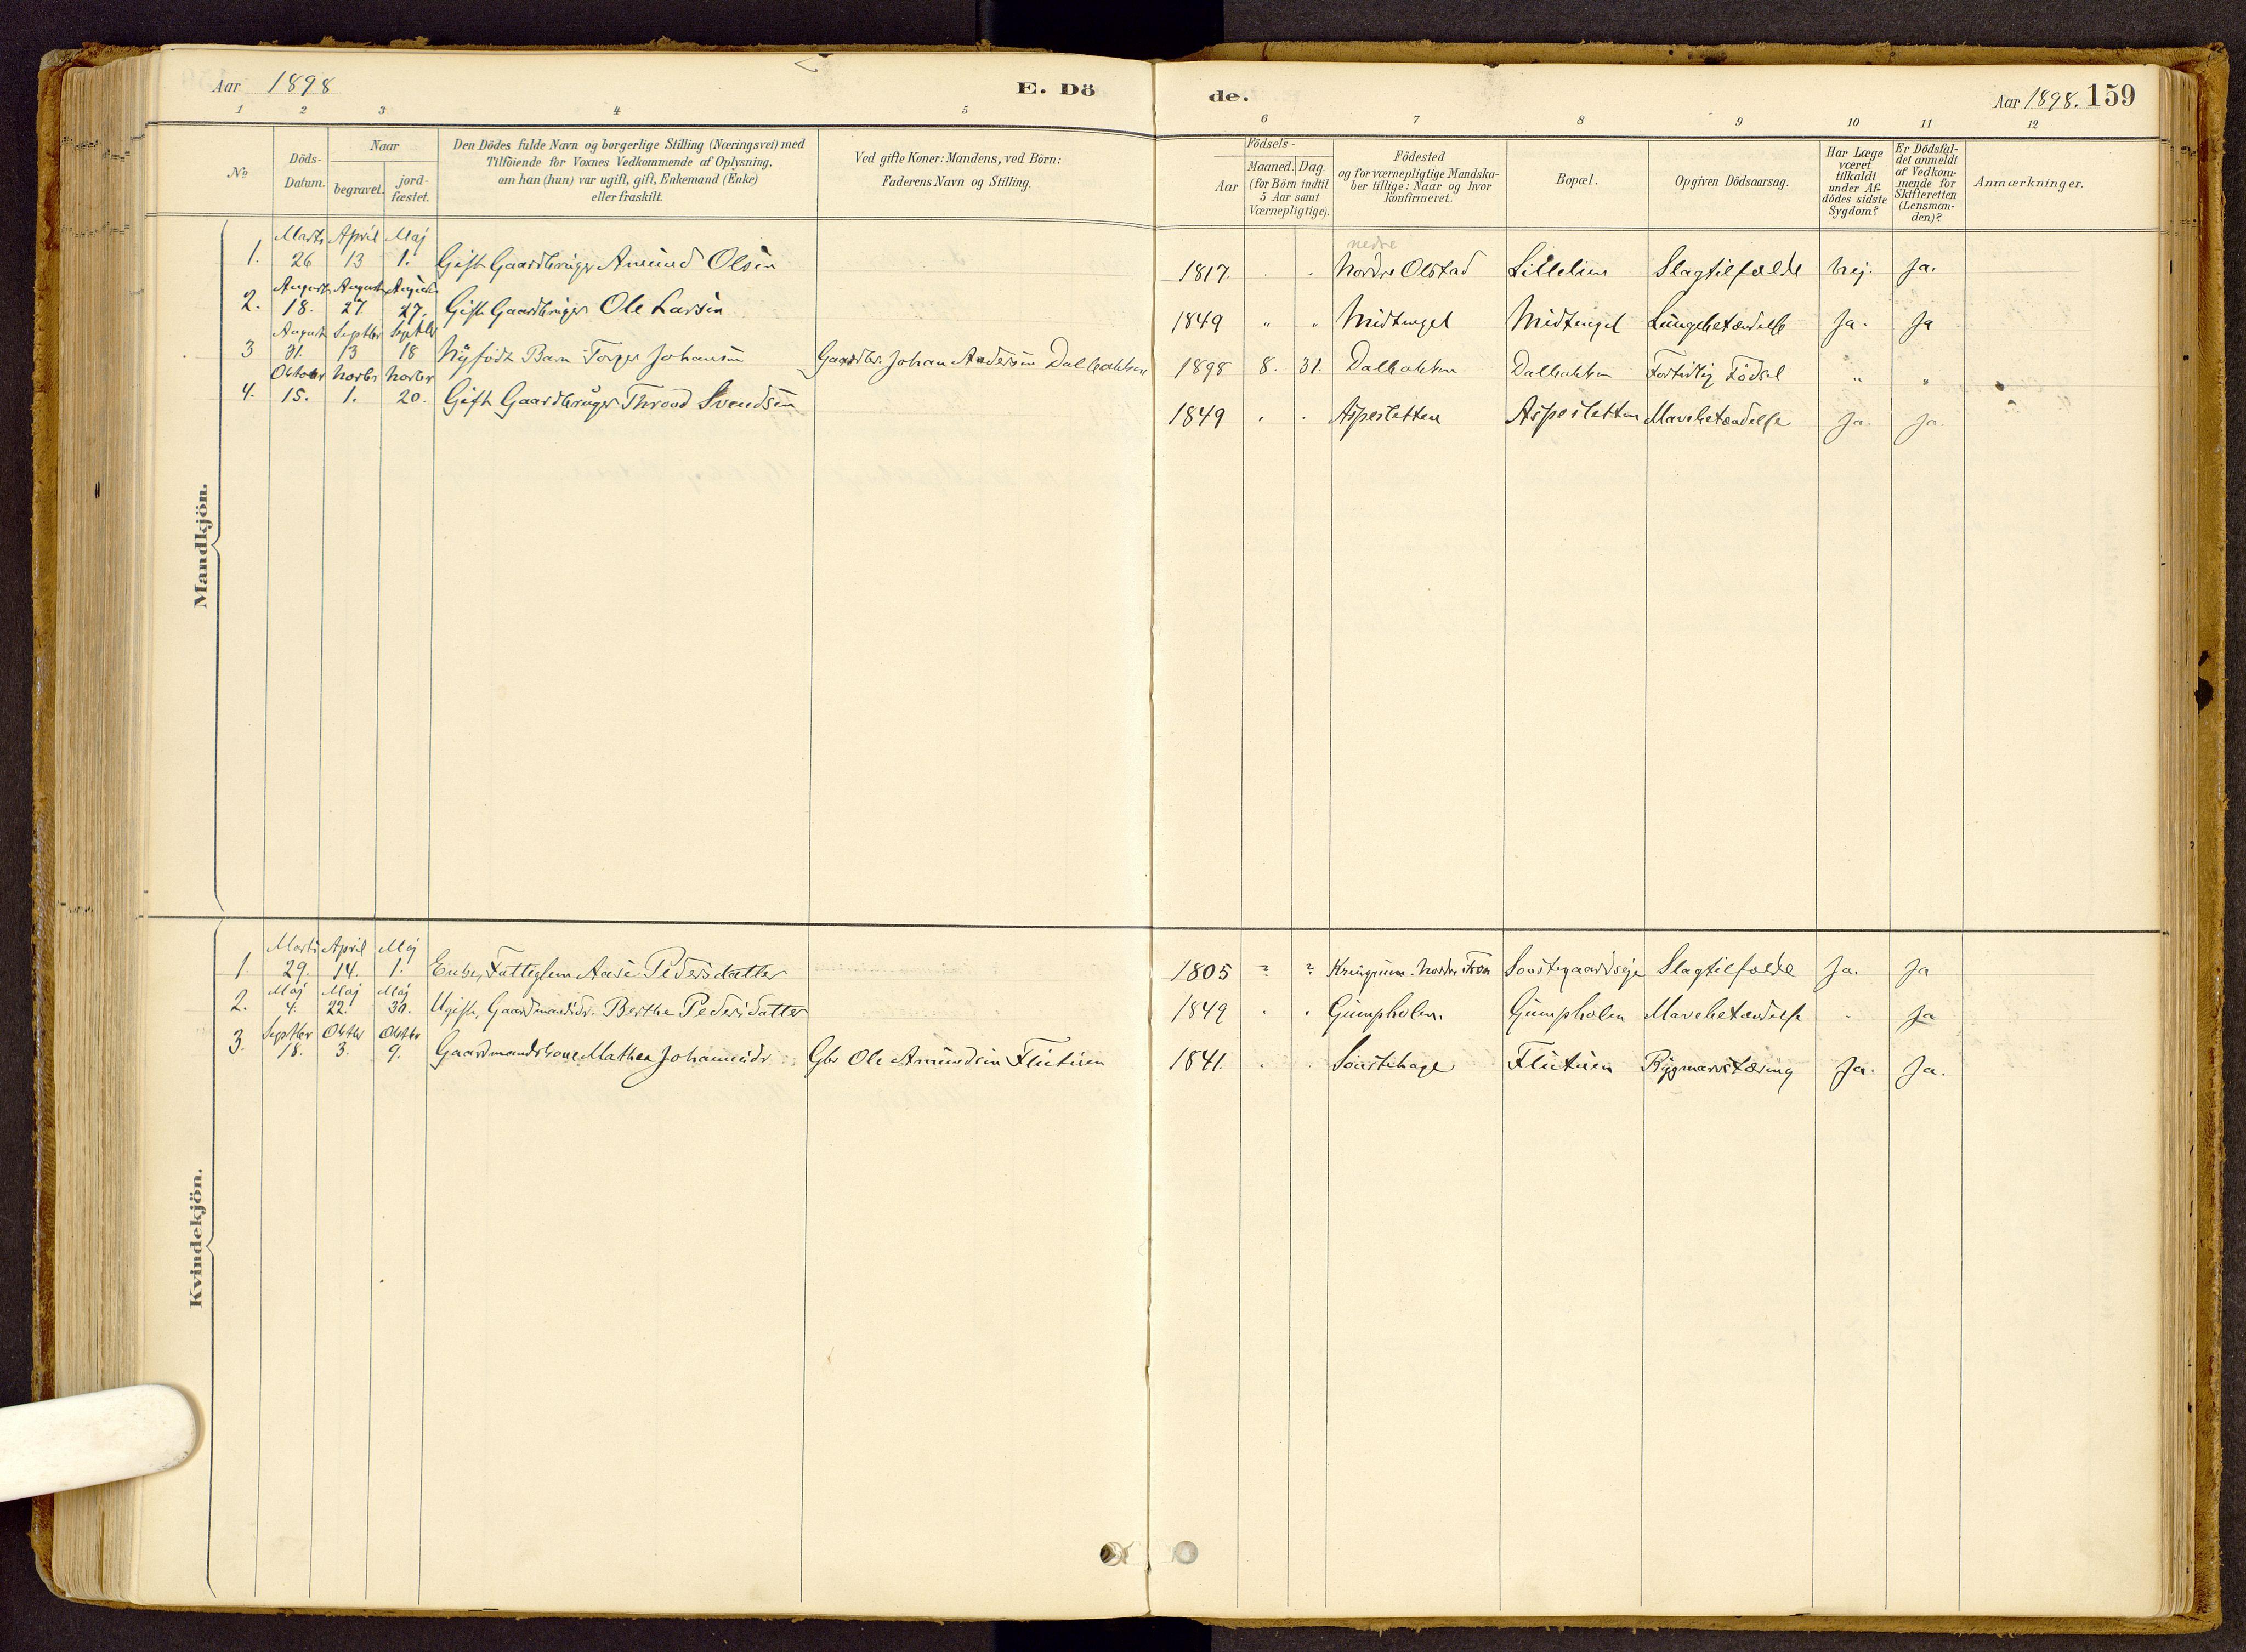 SAH, Vestre Gausdal prestekontor, Ministerialbok nr. 2, 1887-1918, s. 159